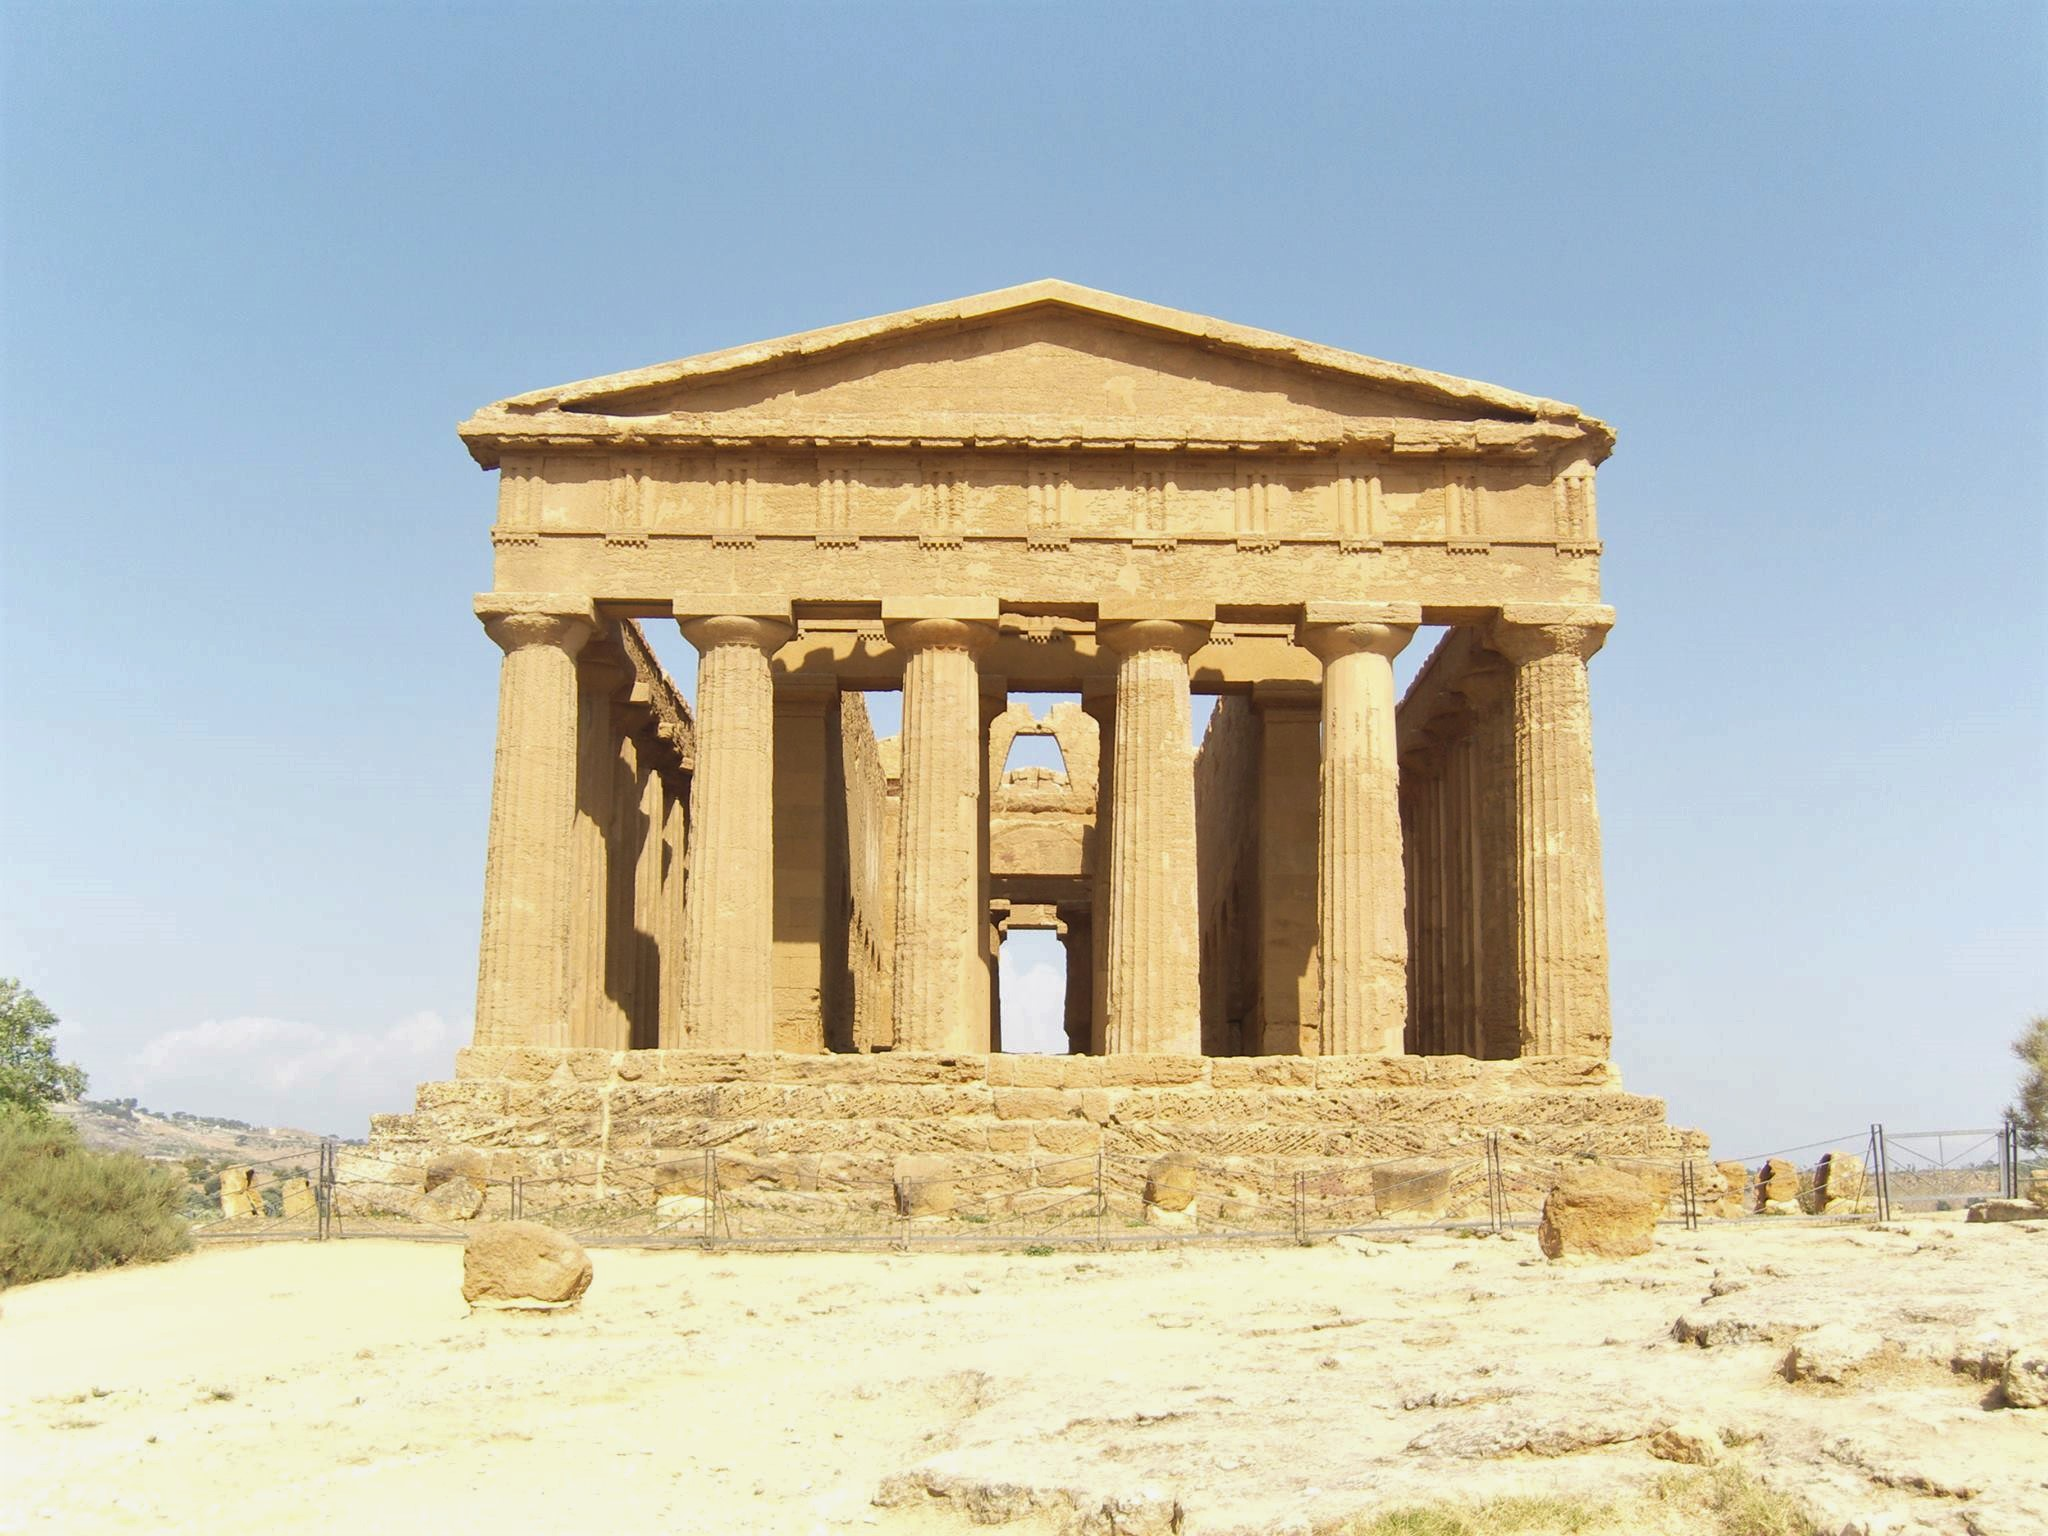 I siti archeologici più belli: la valle dei Templi